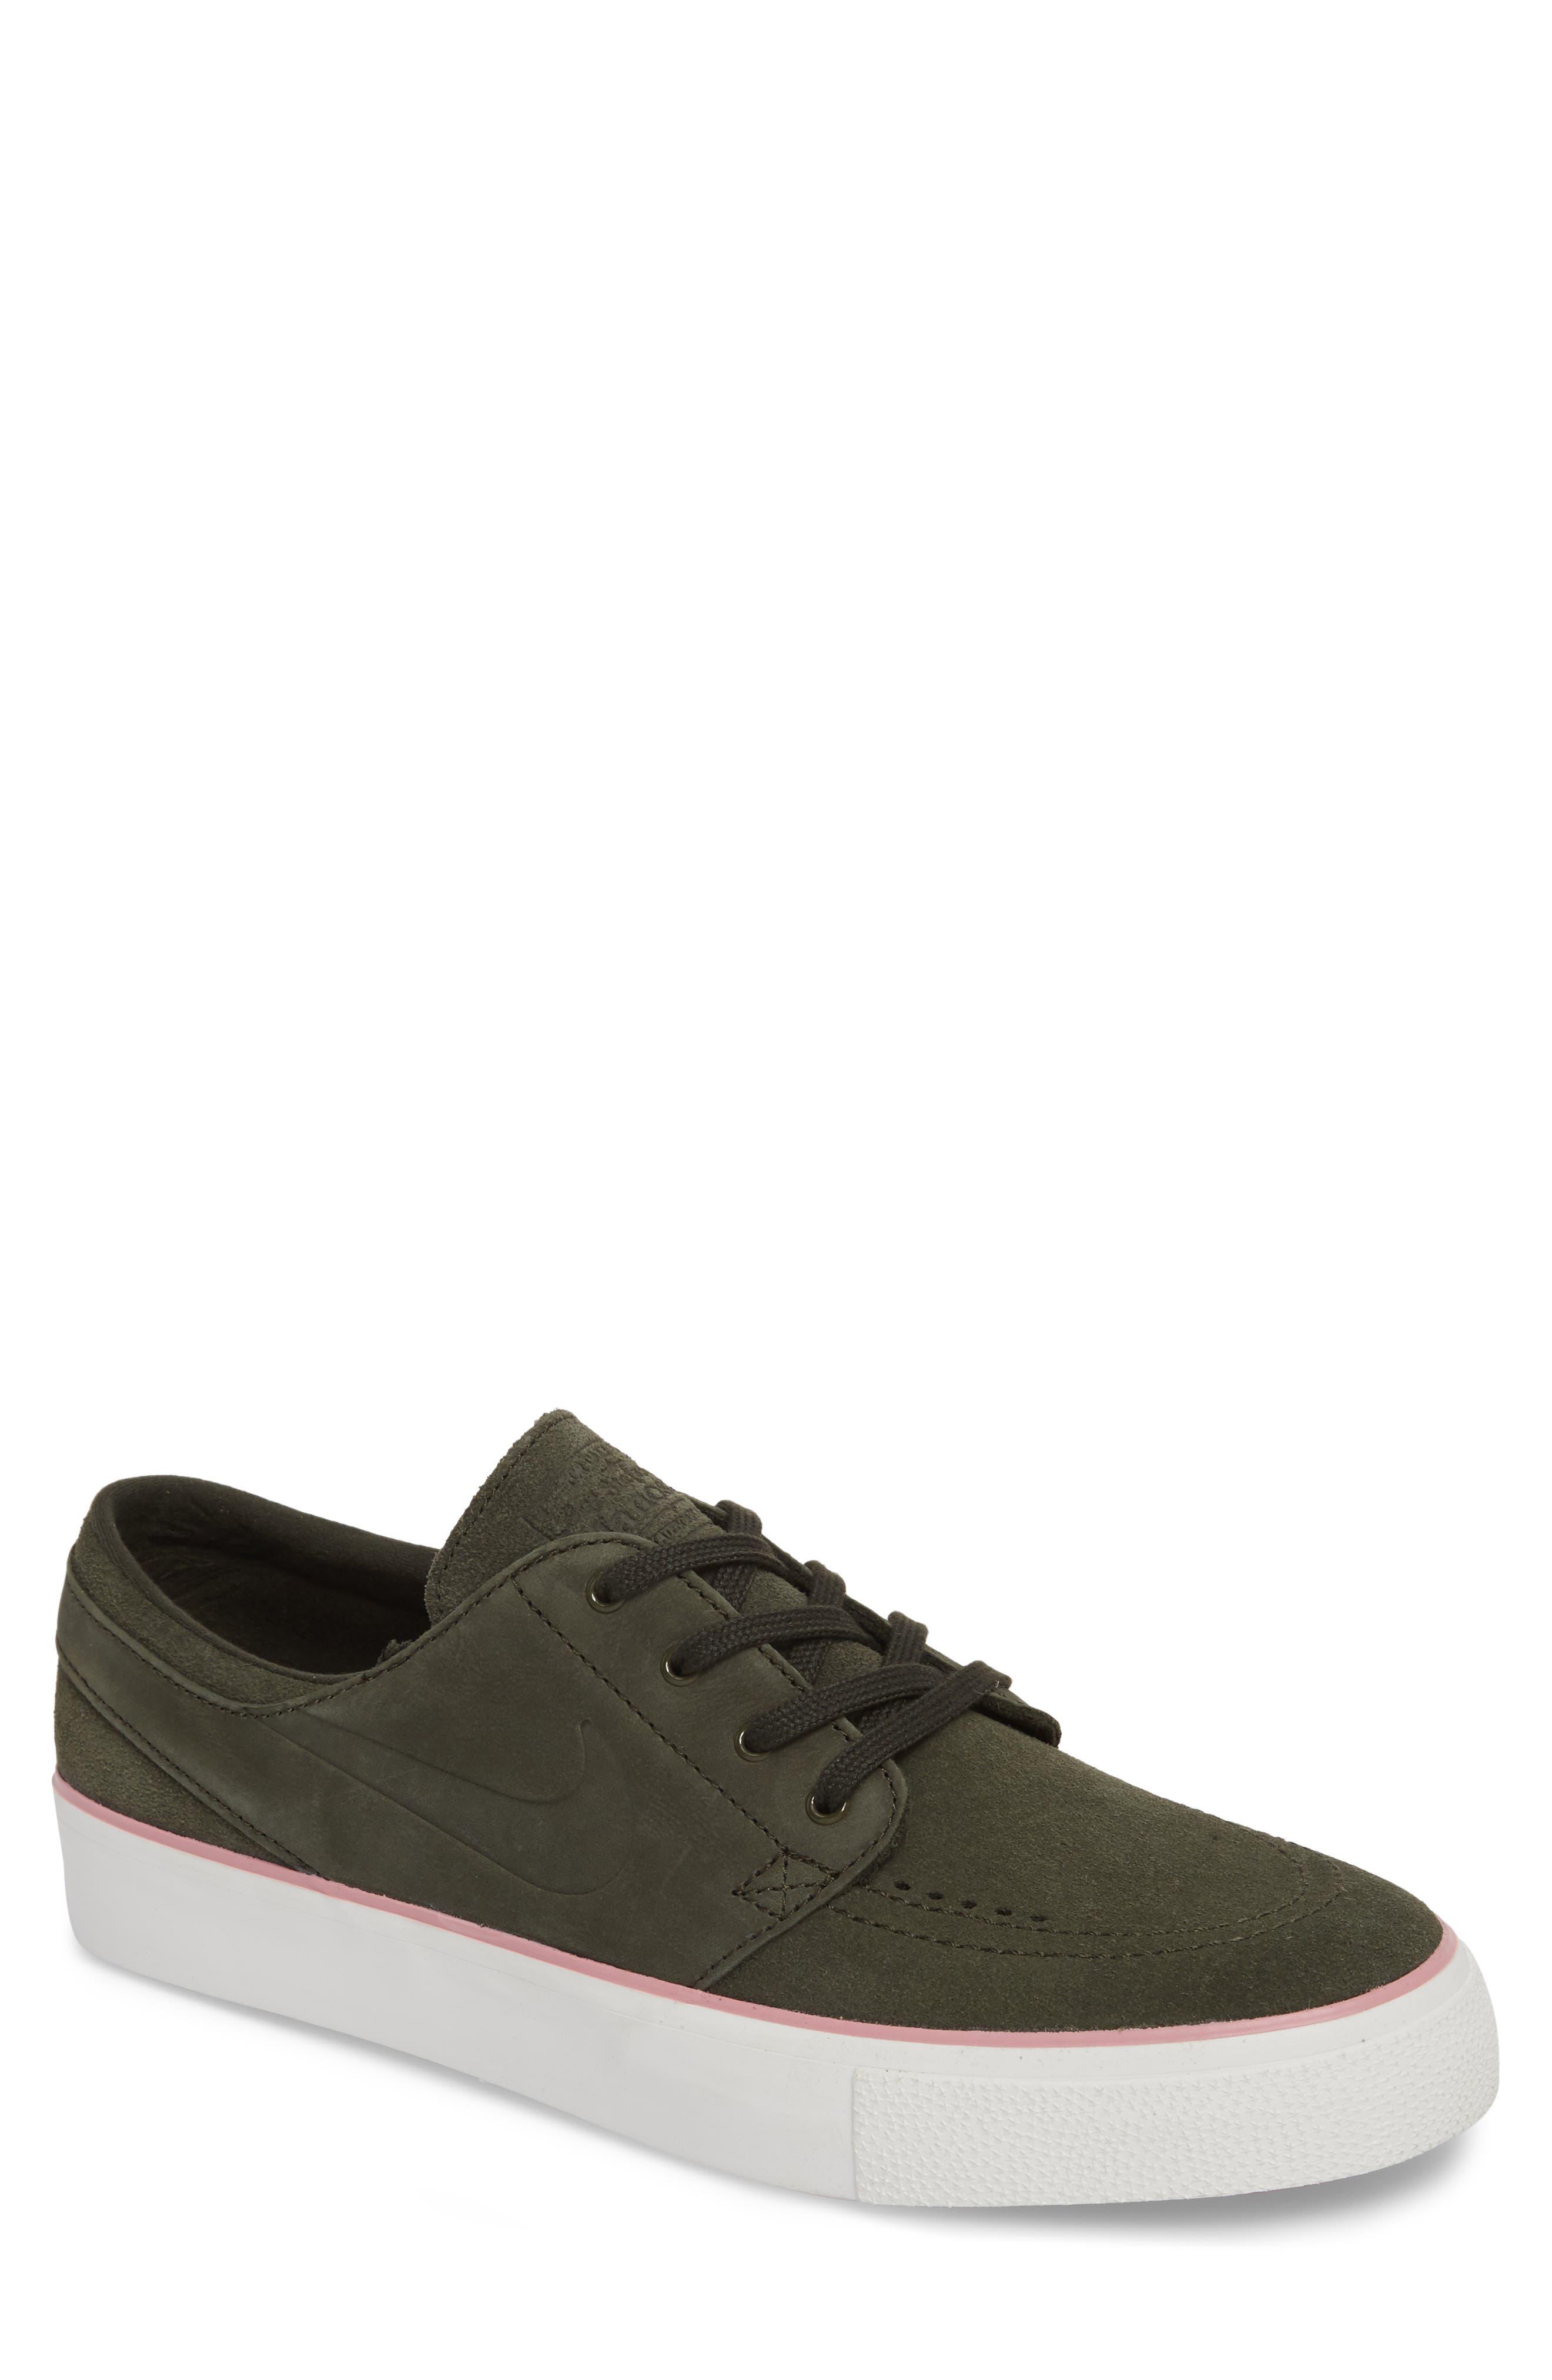 Zoom - Stefan Janoski SB Low Top Sneaker,                             Main thumbnail 1, color,                             300